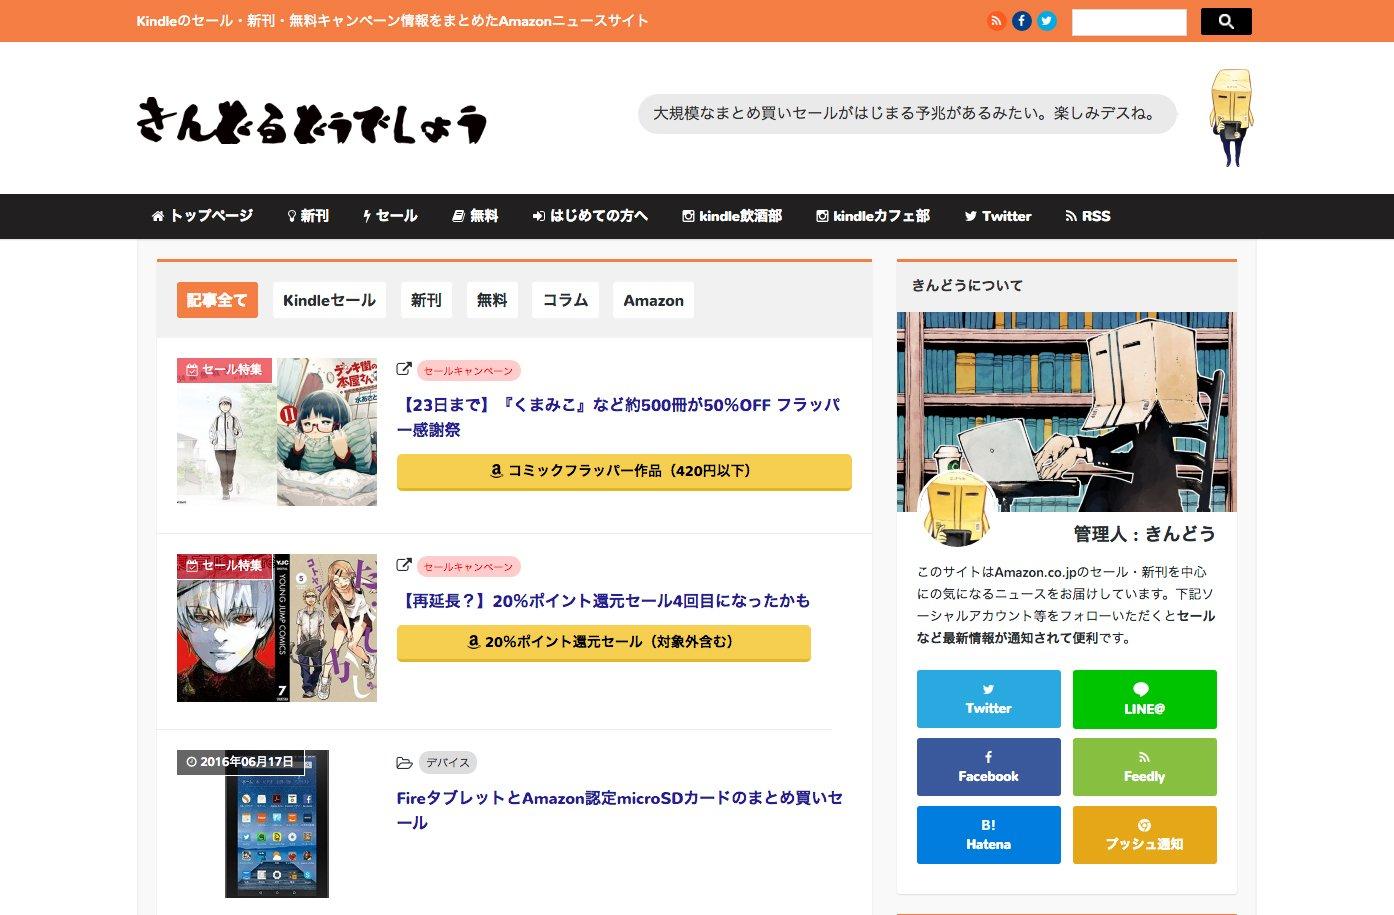 Kindleニュースサイト「きんどう」